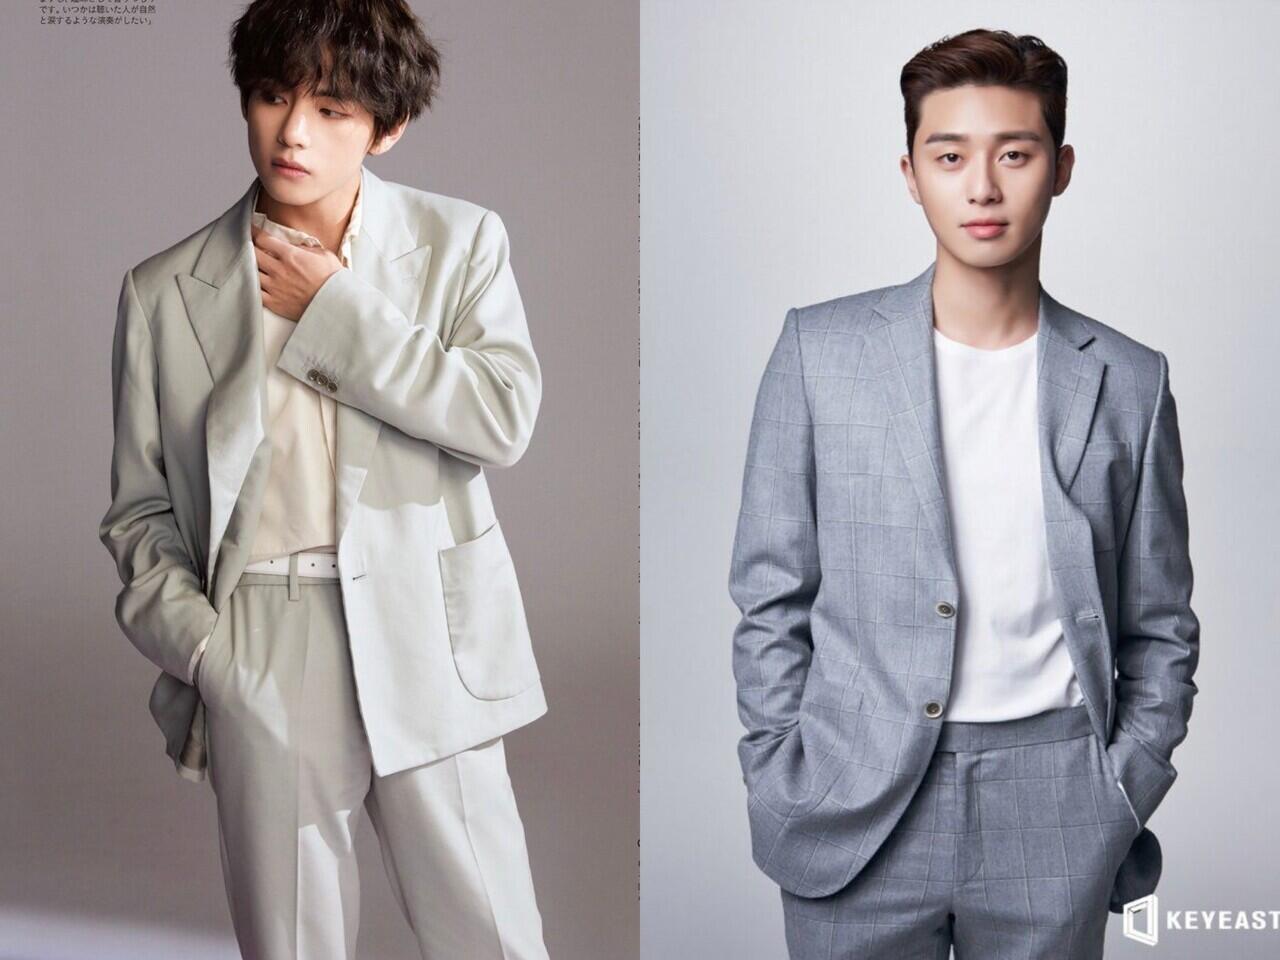 V Bts Kunjungi Park Seo Joon Di Set Drama Itaewon Class Kekoreaan